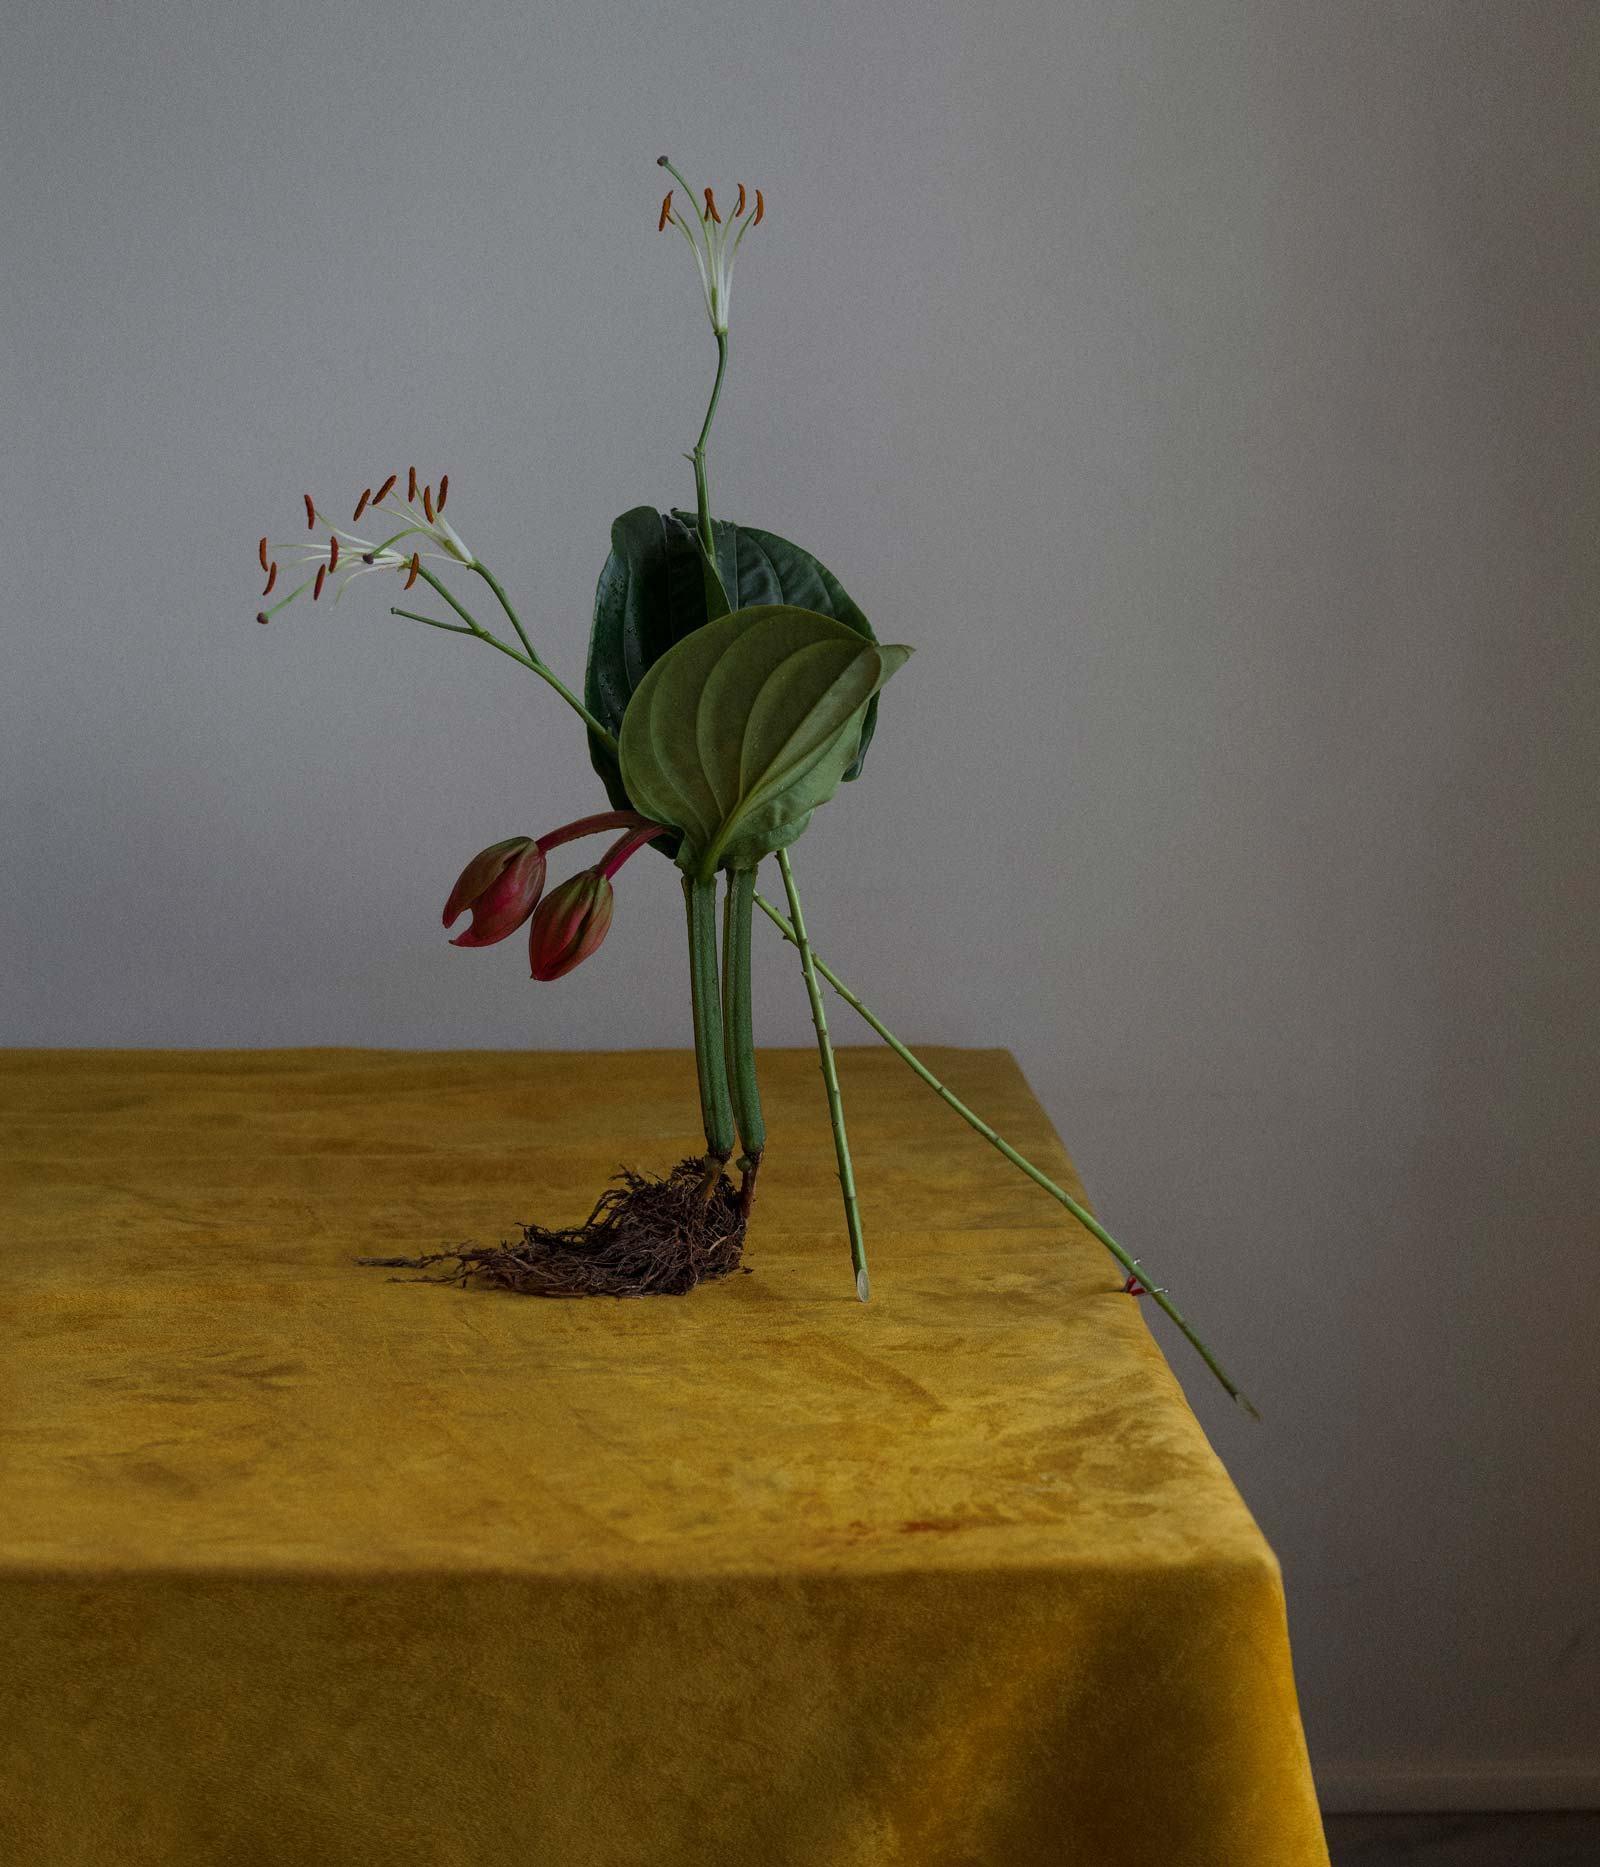 IGNANT-Art-Dominik-Tarabański-Roses-For-Mother-3